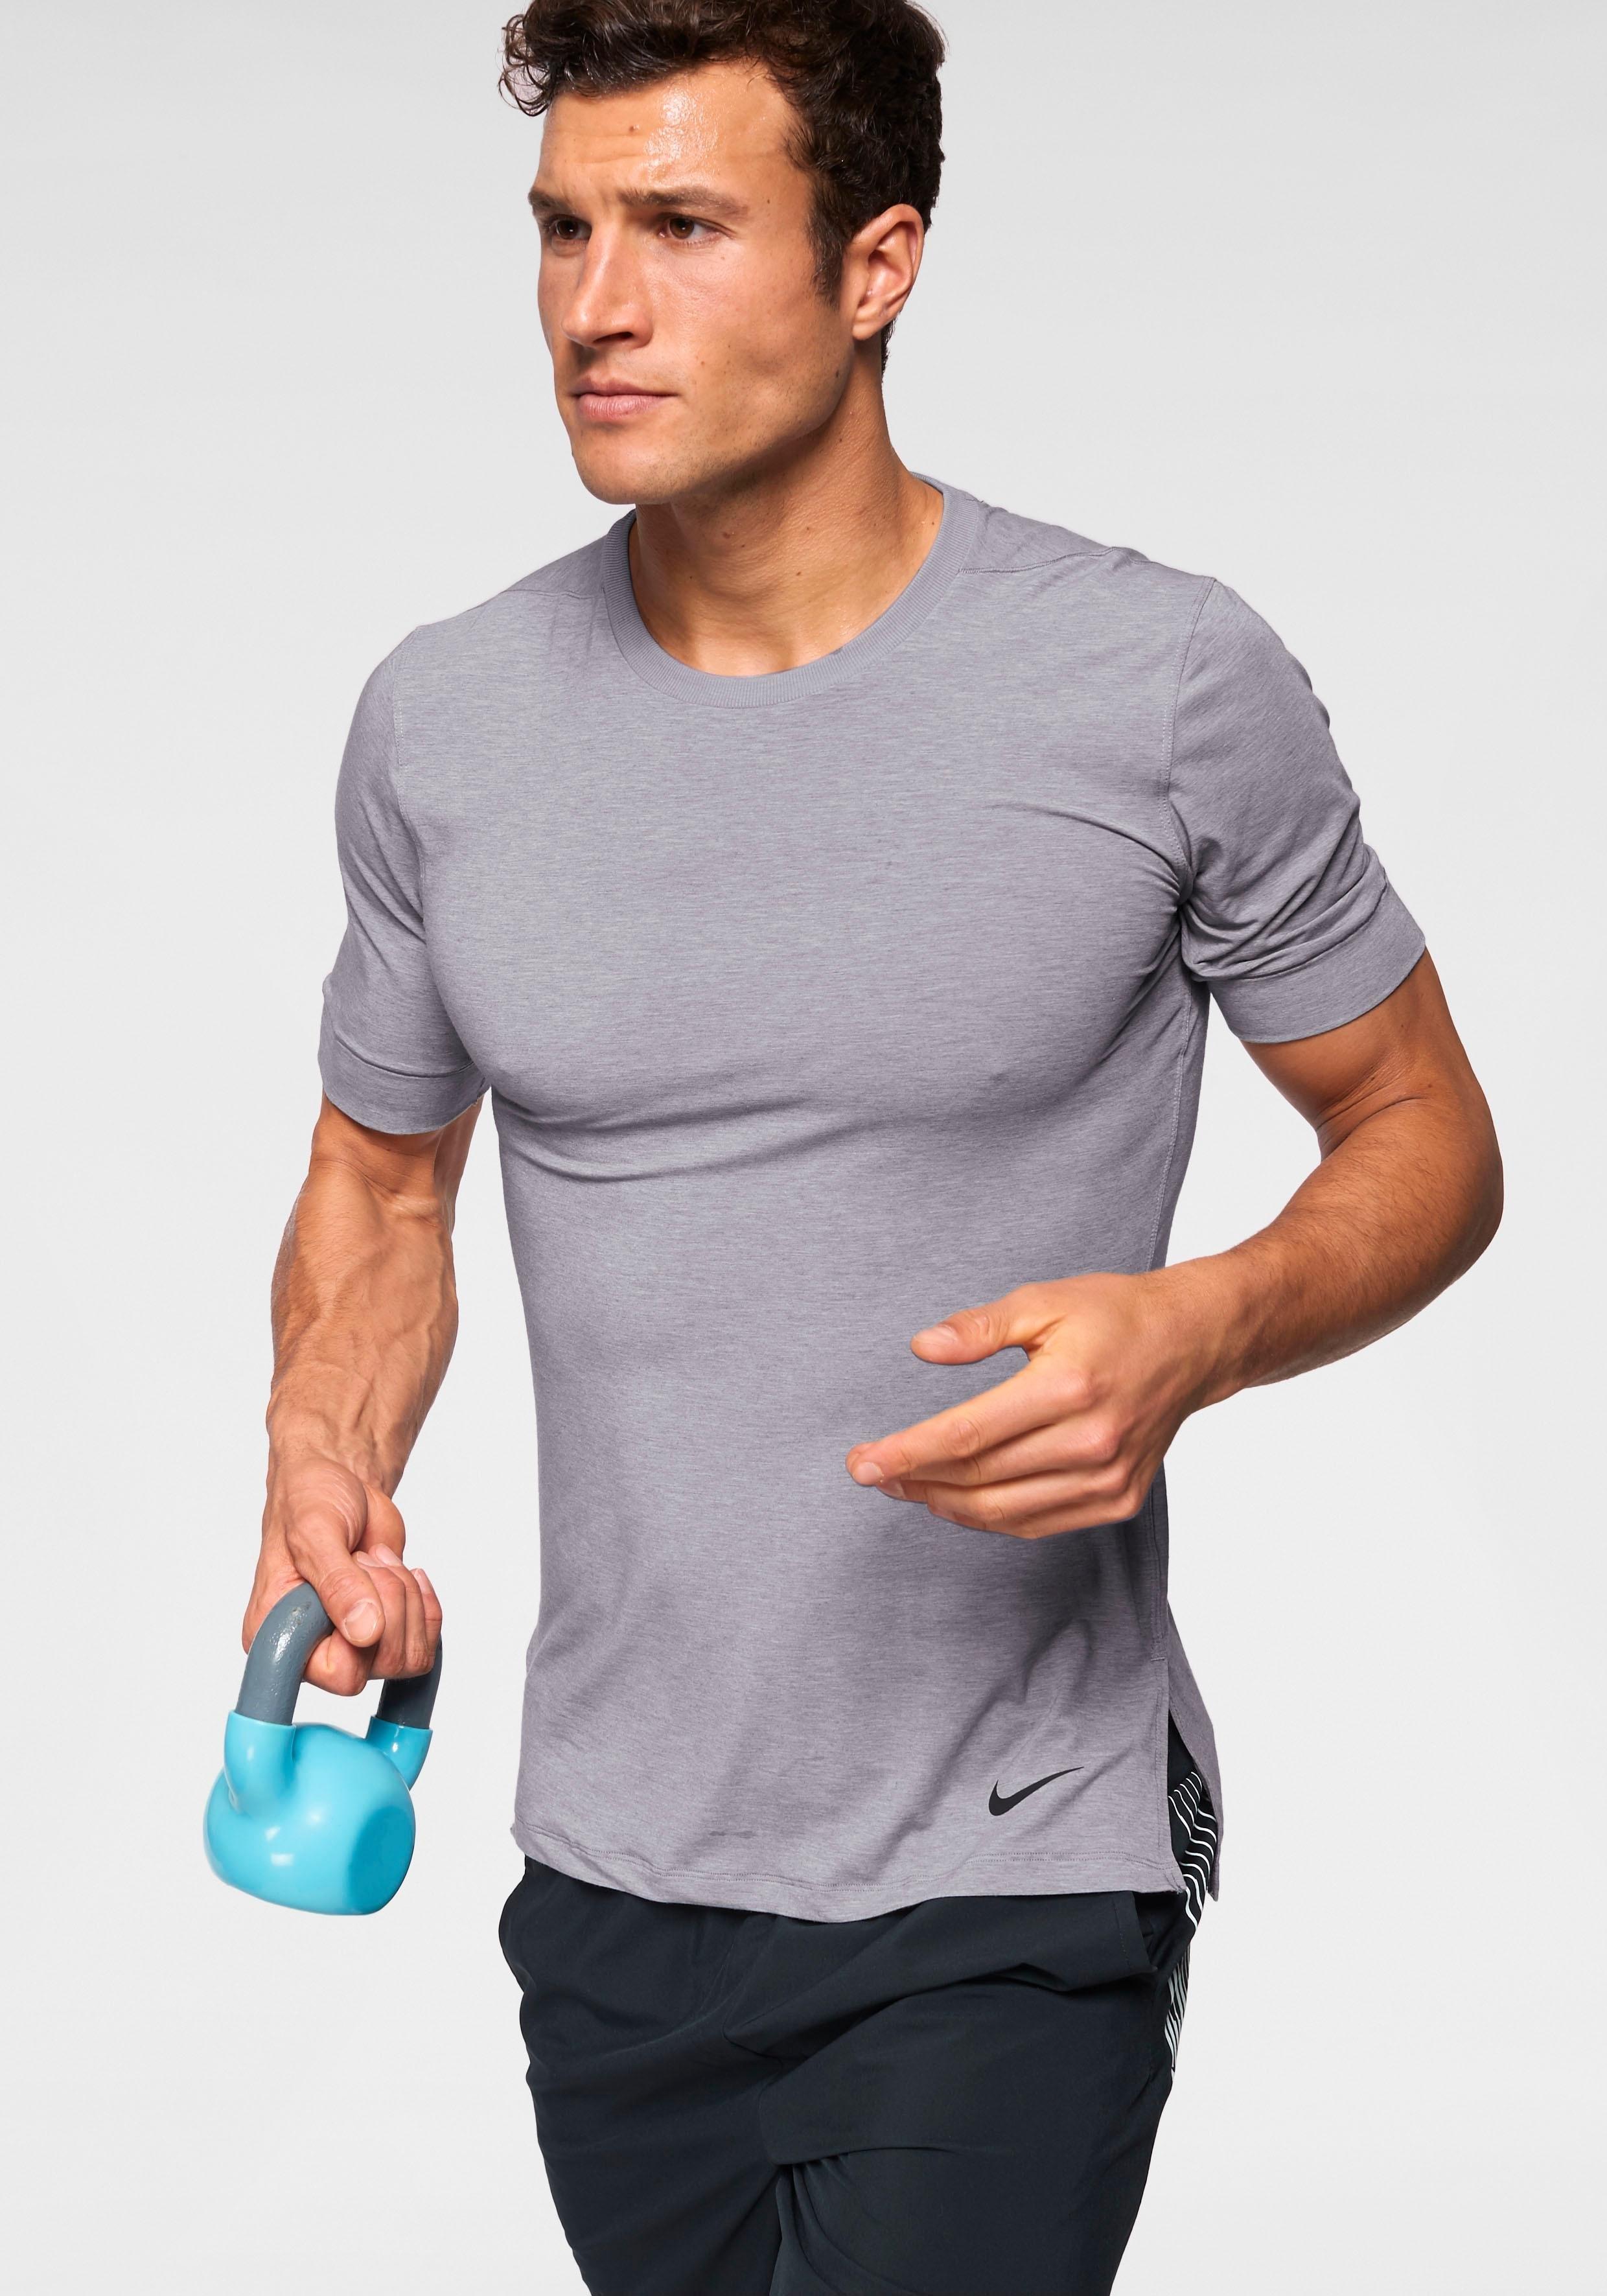 Online Dry Verkrijgbaar Nike Nk Top Ss Trainingsshirtm Transcend QCxerBWdoE